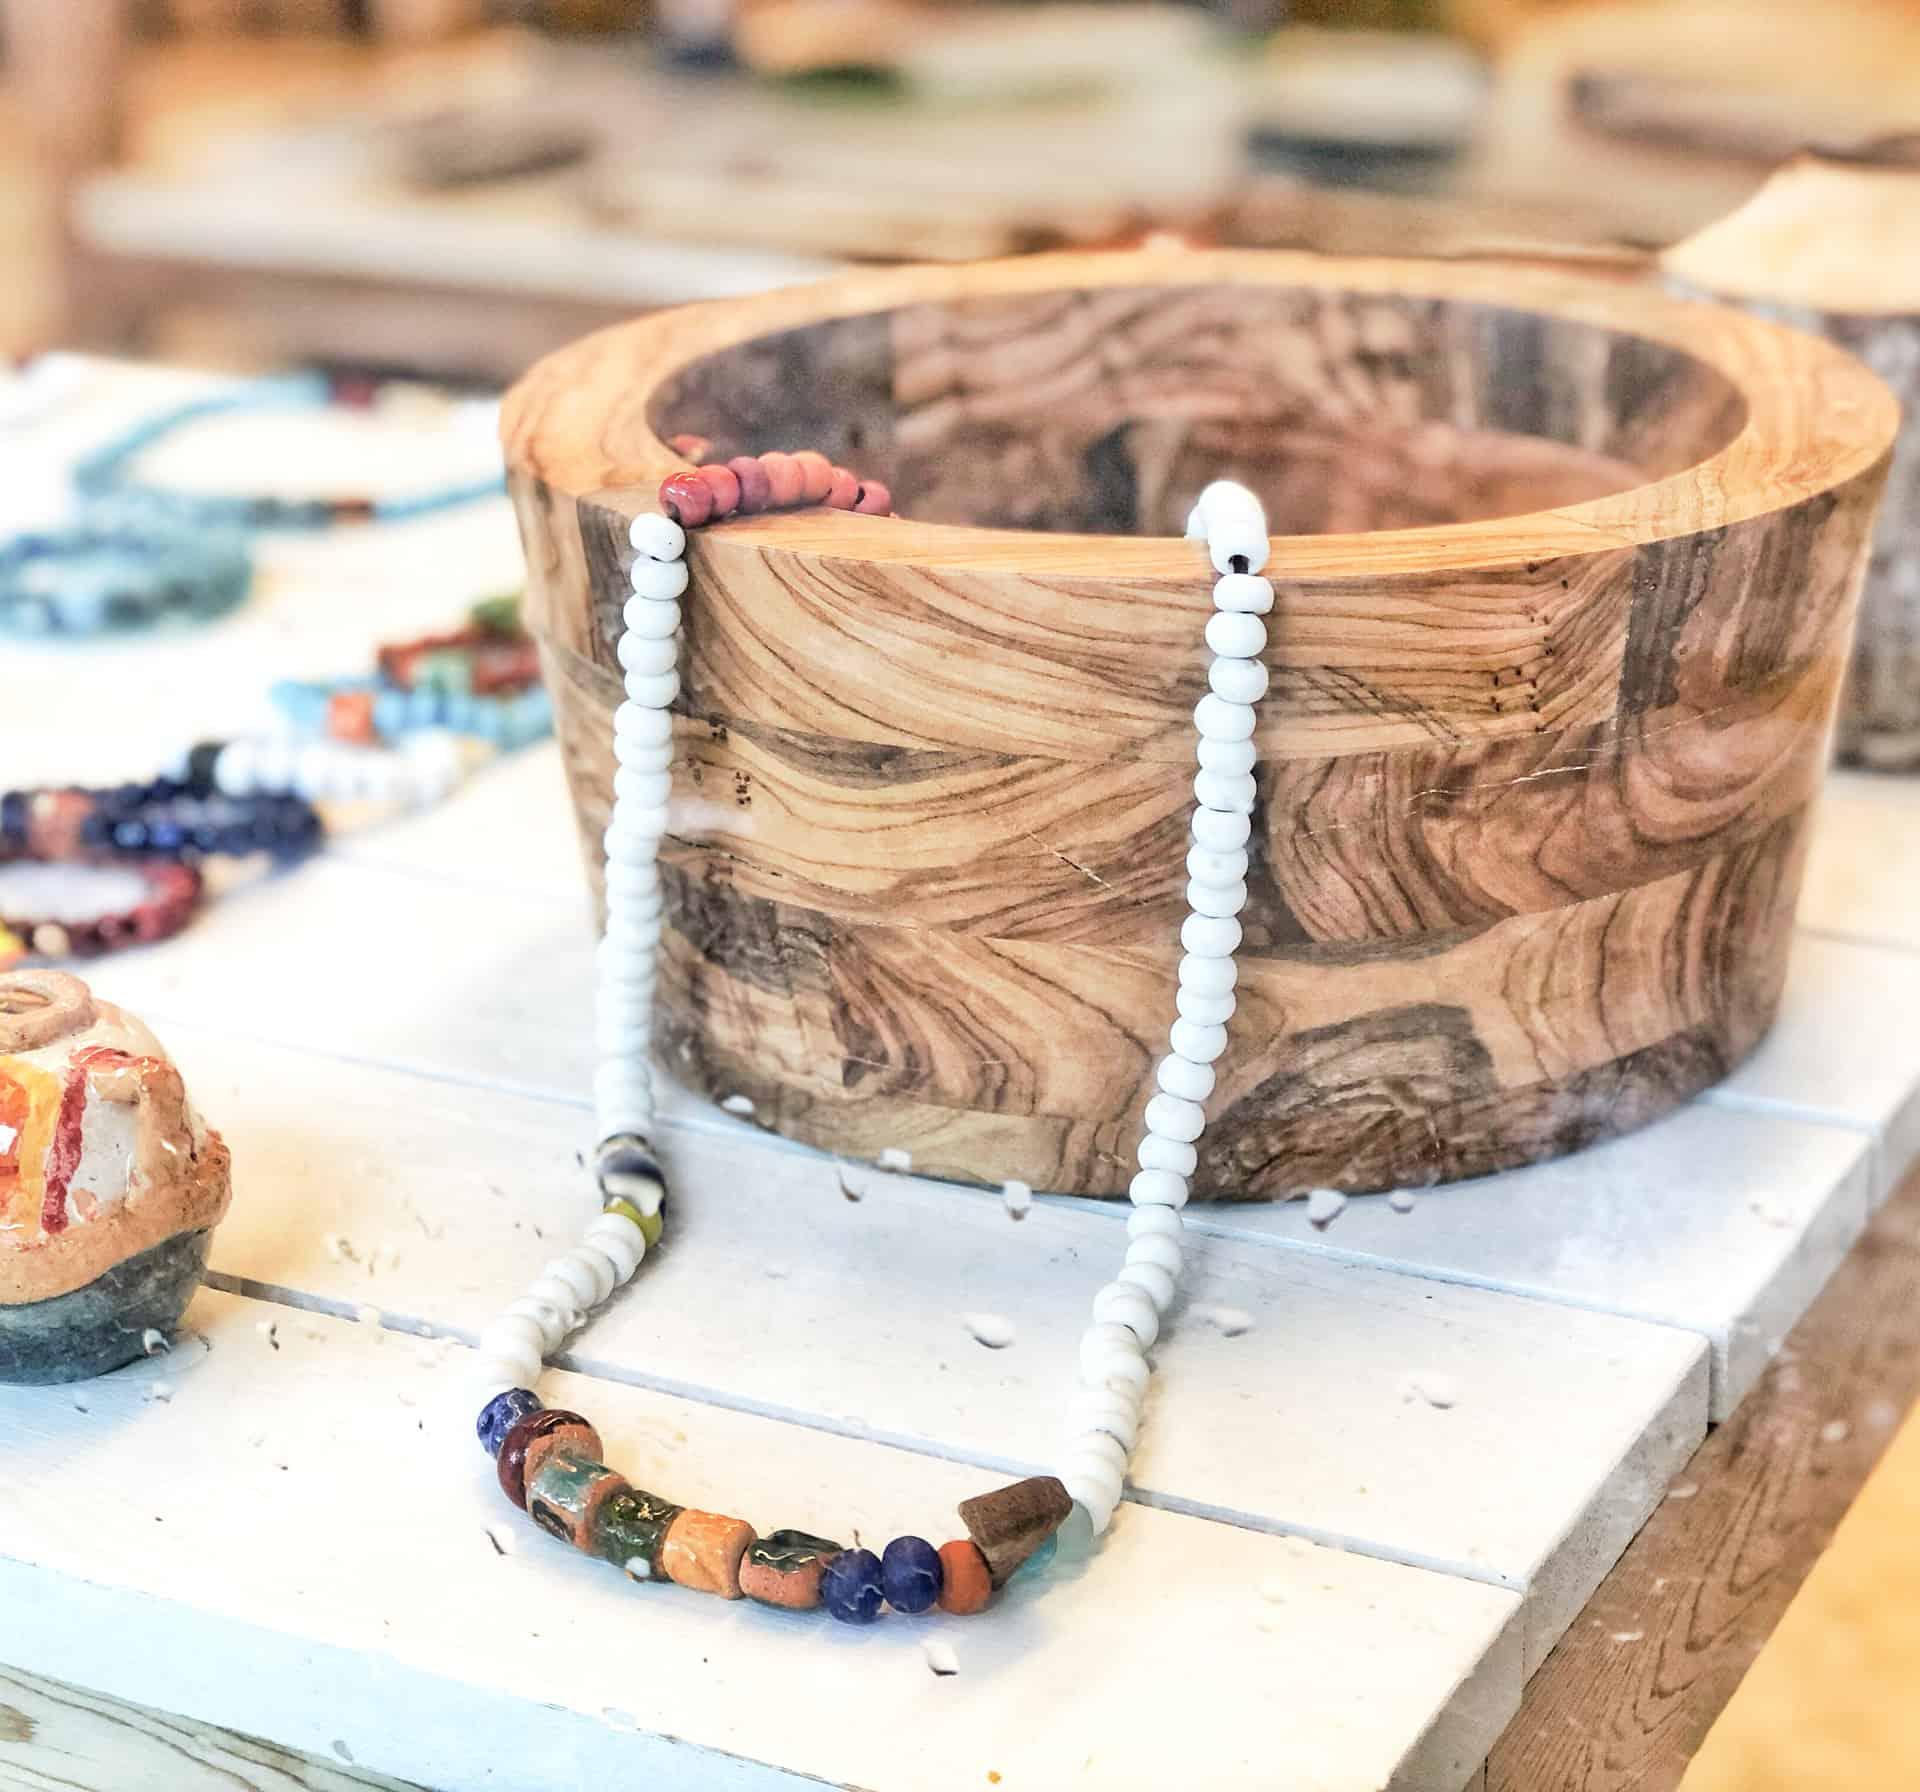 Kılçık concept Turkish workshop, handmade jewelleries and wooden pieces